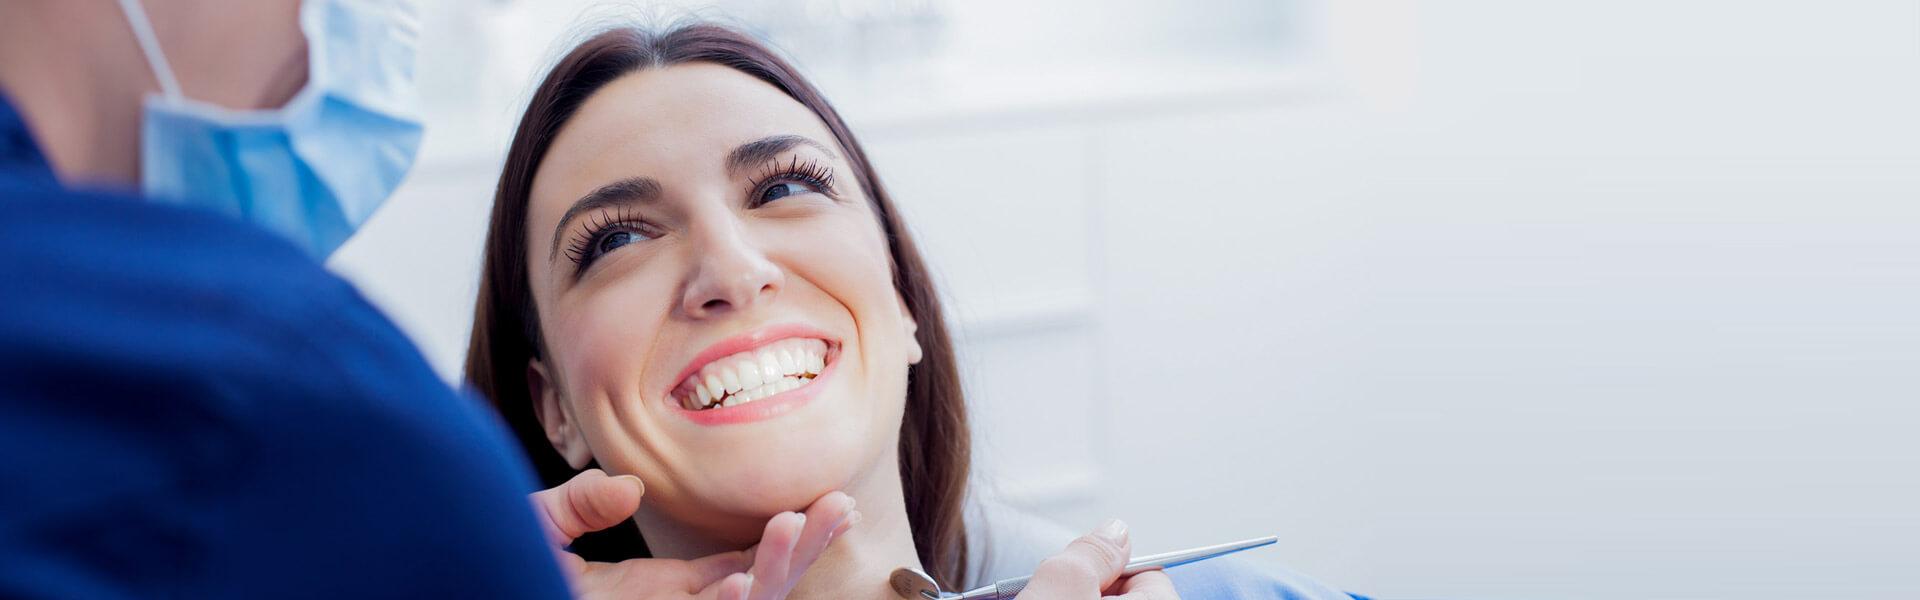 Dental Treatment In Ahmedabad – A Formula For Success Dental Lifestyle